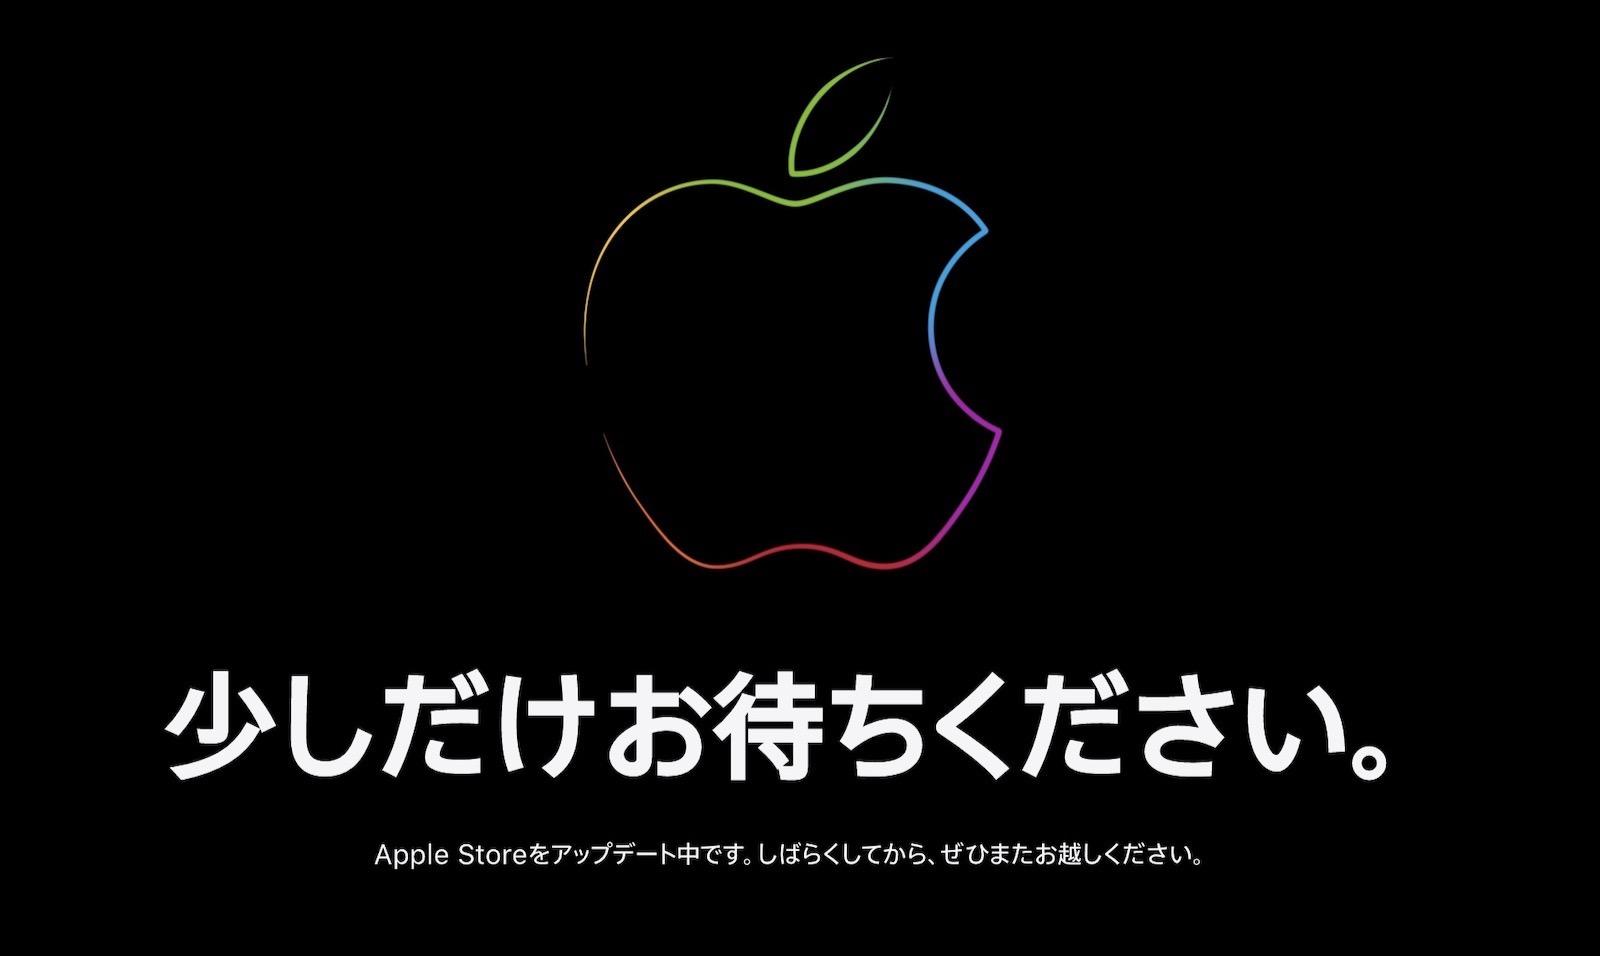 Apple Store Sitemap maintenance mode